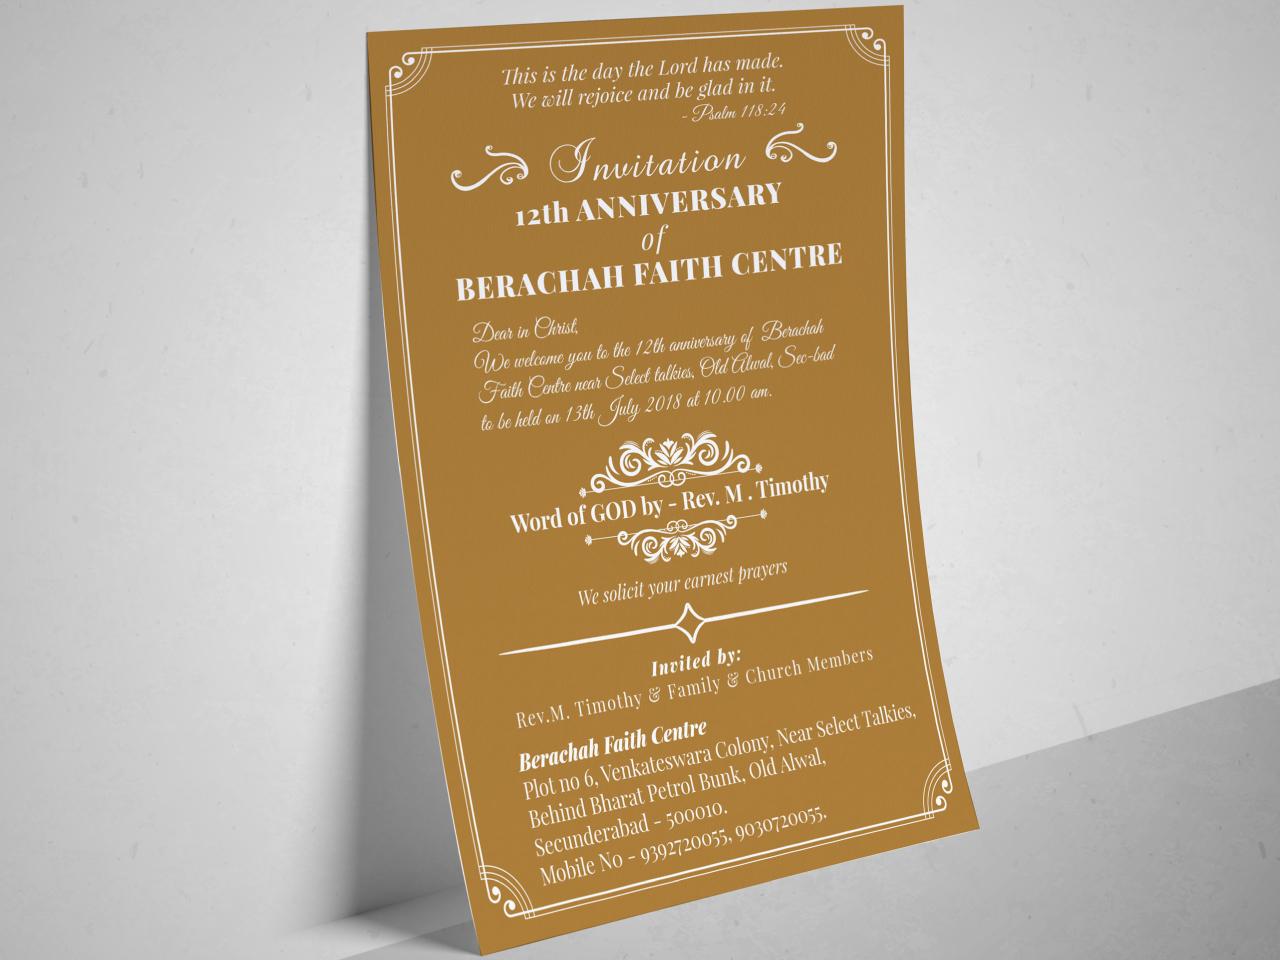 Berachah Faith Centre Anniversary Event Invitation Card By